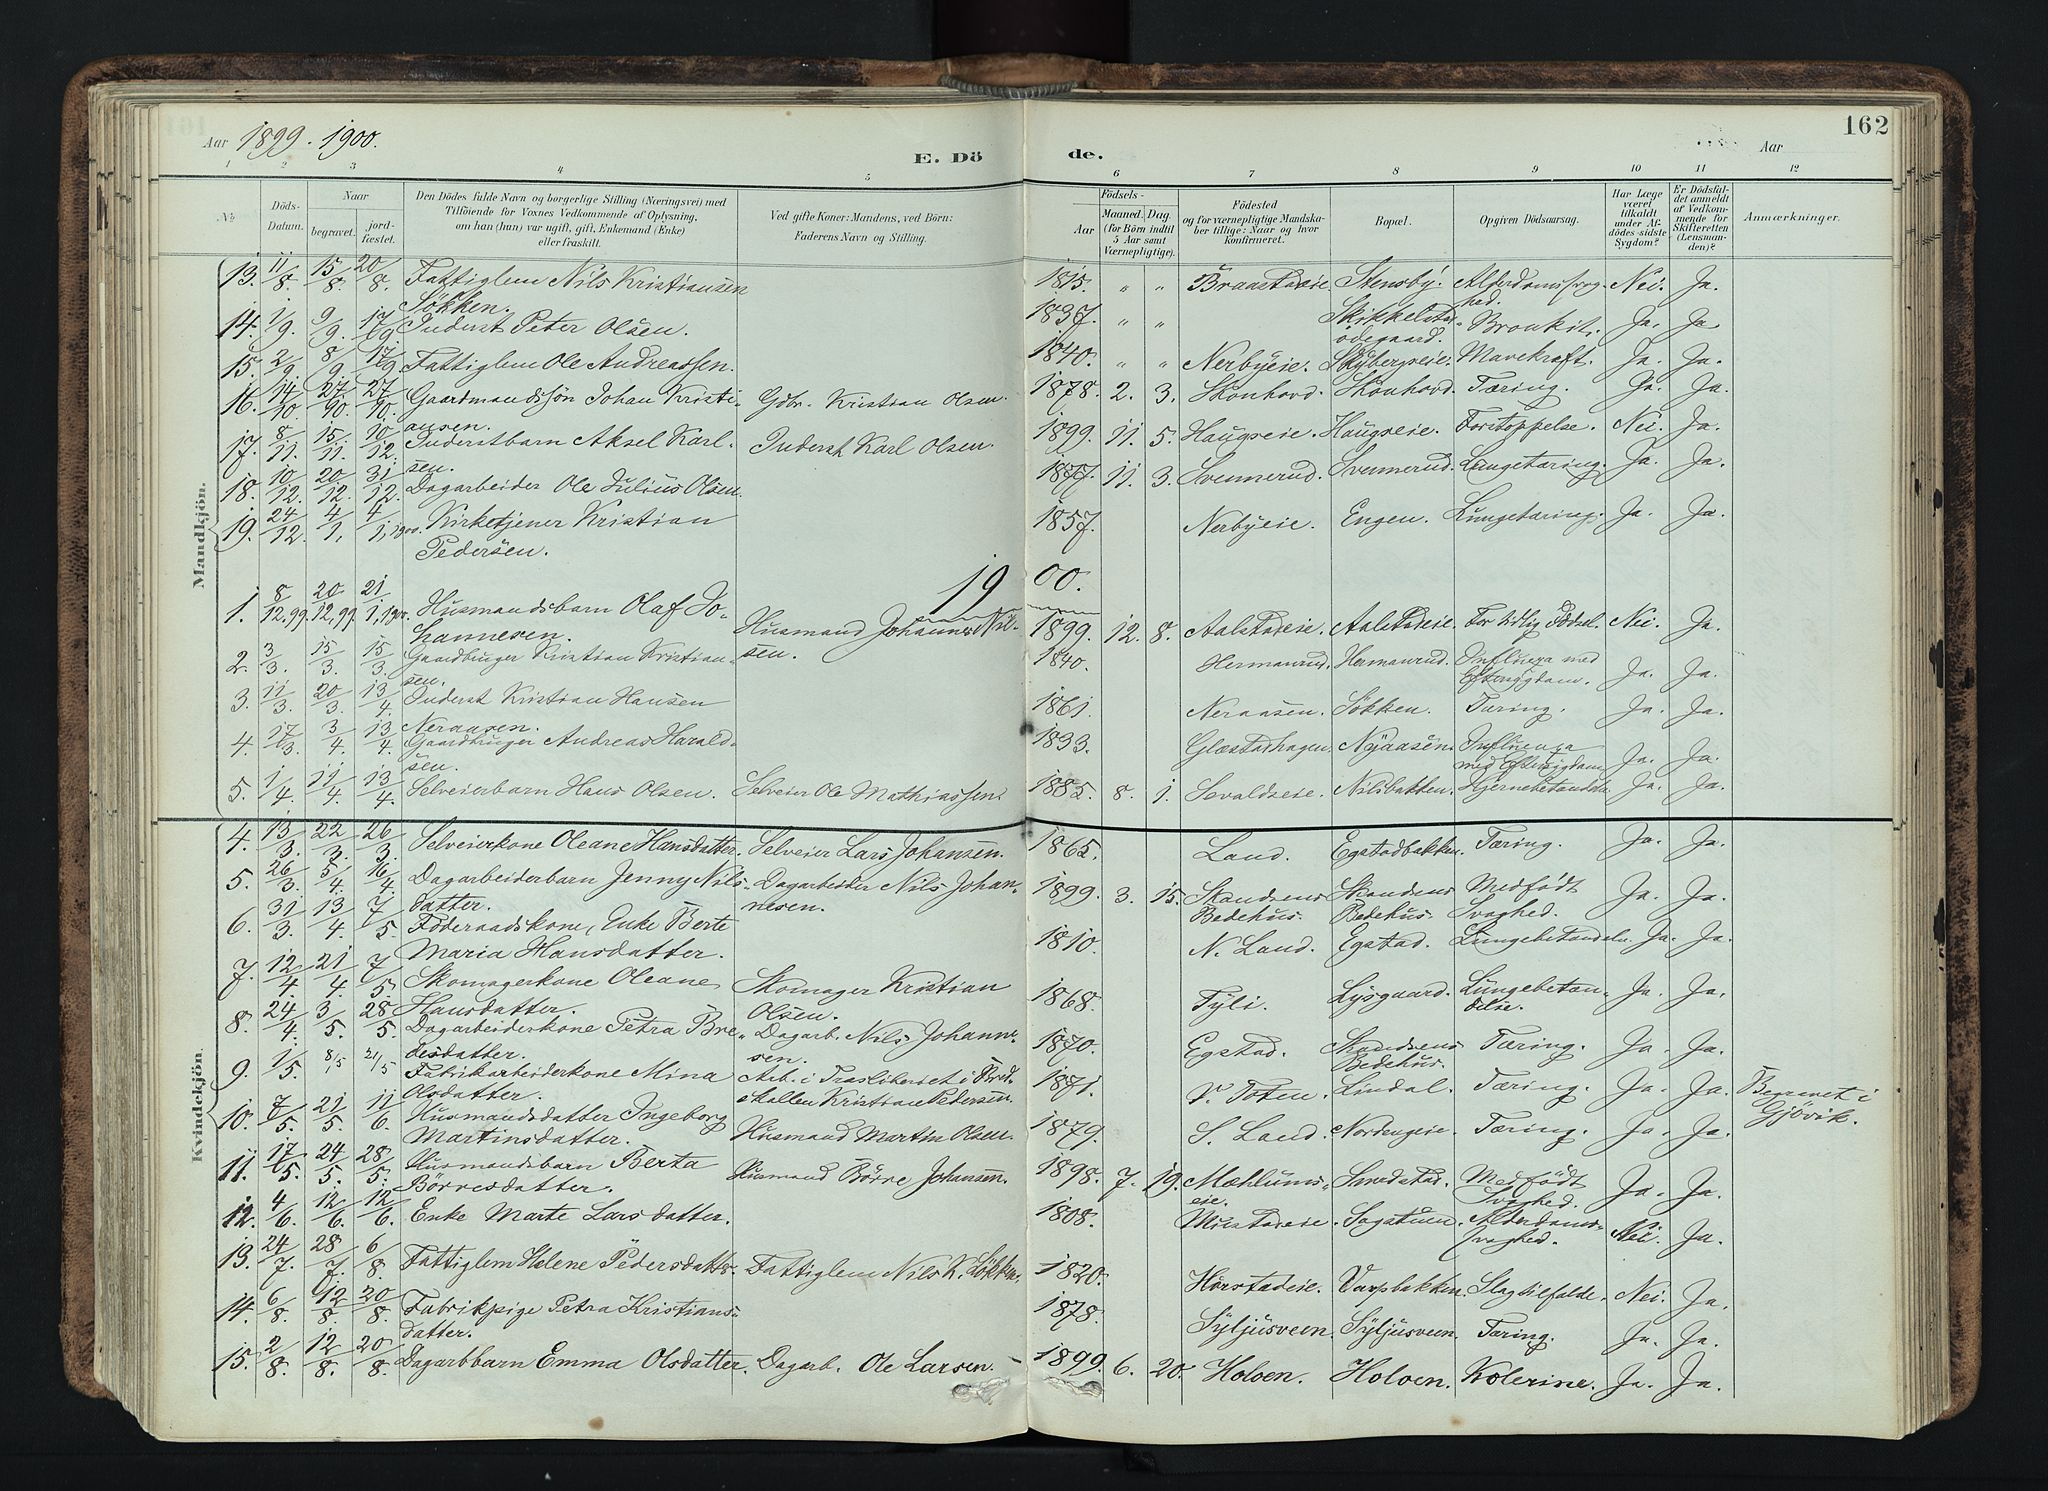 SAH, Vardal prestekontor, H/Ha/Haa/L0019: Ministerialbok nr. 19, 1893-1907, s. 162